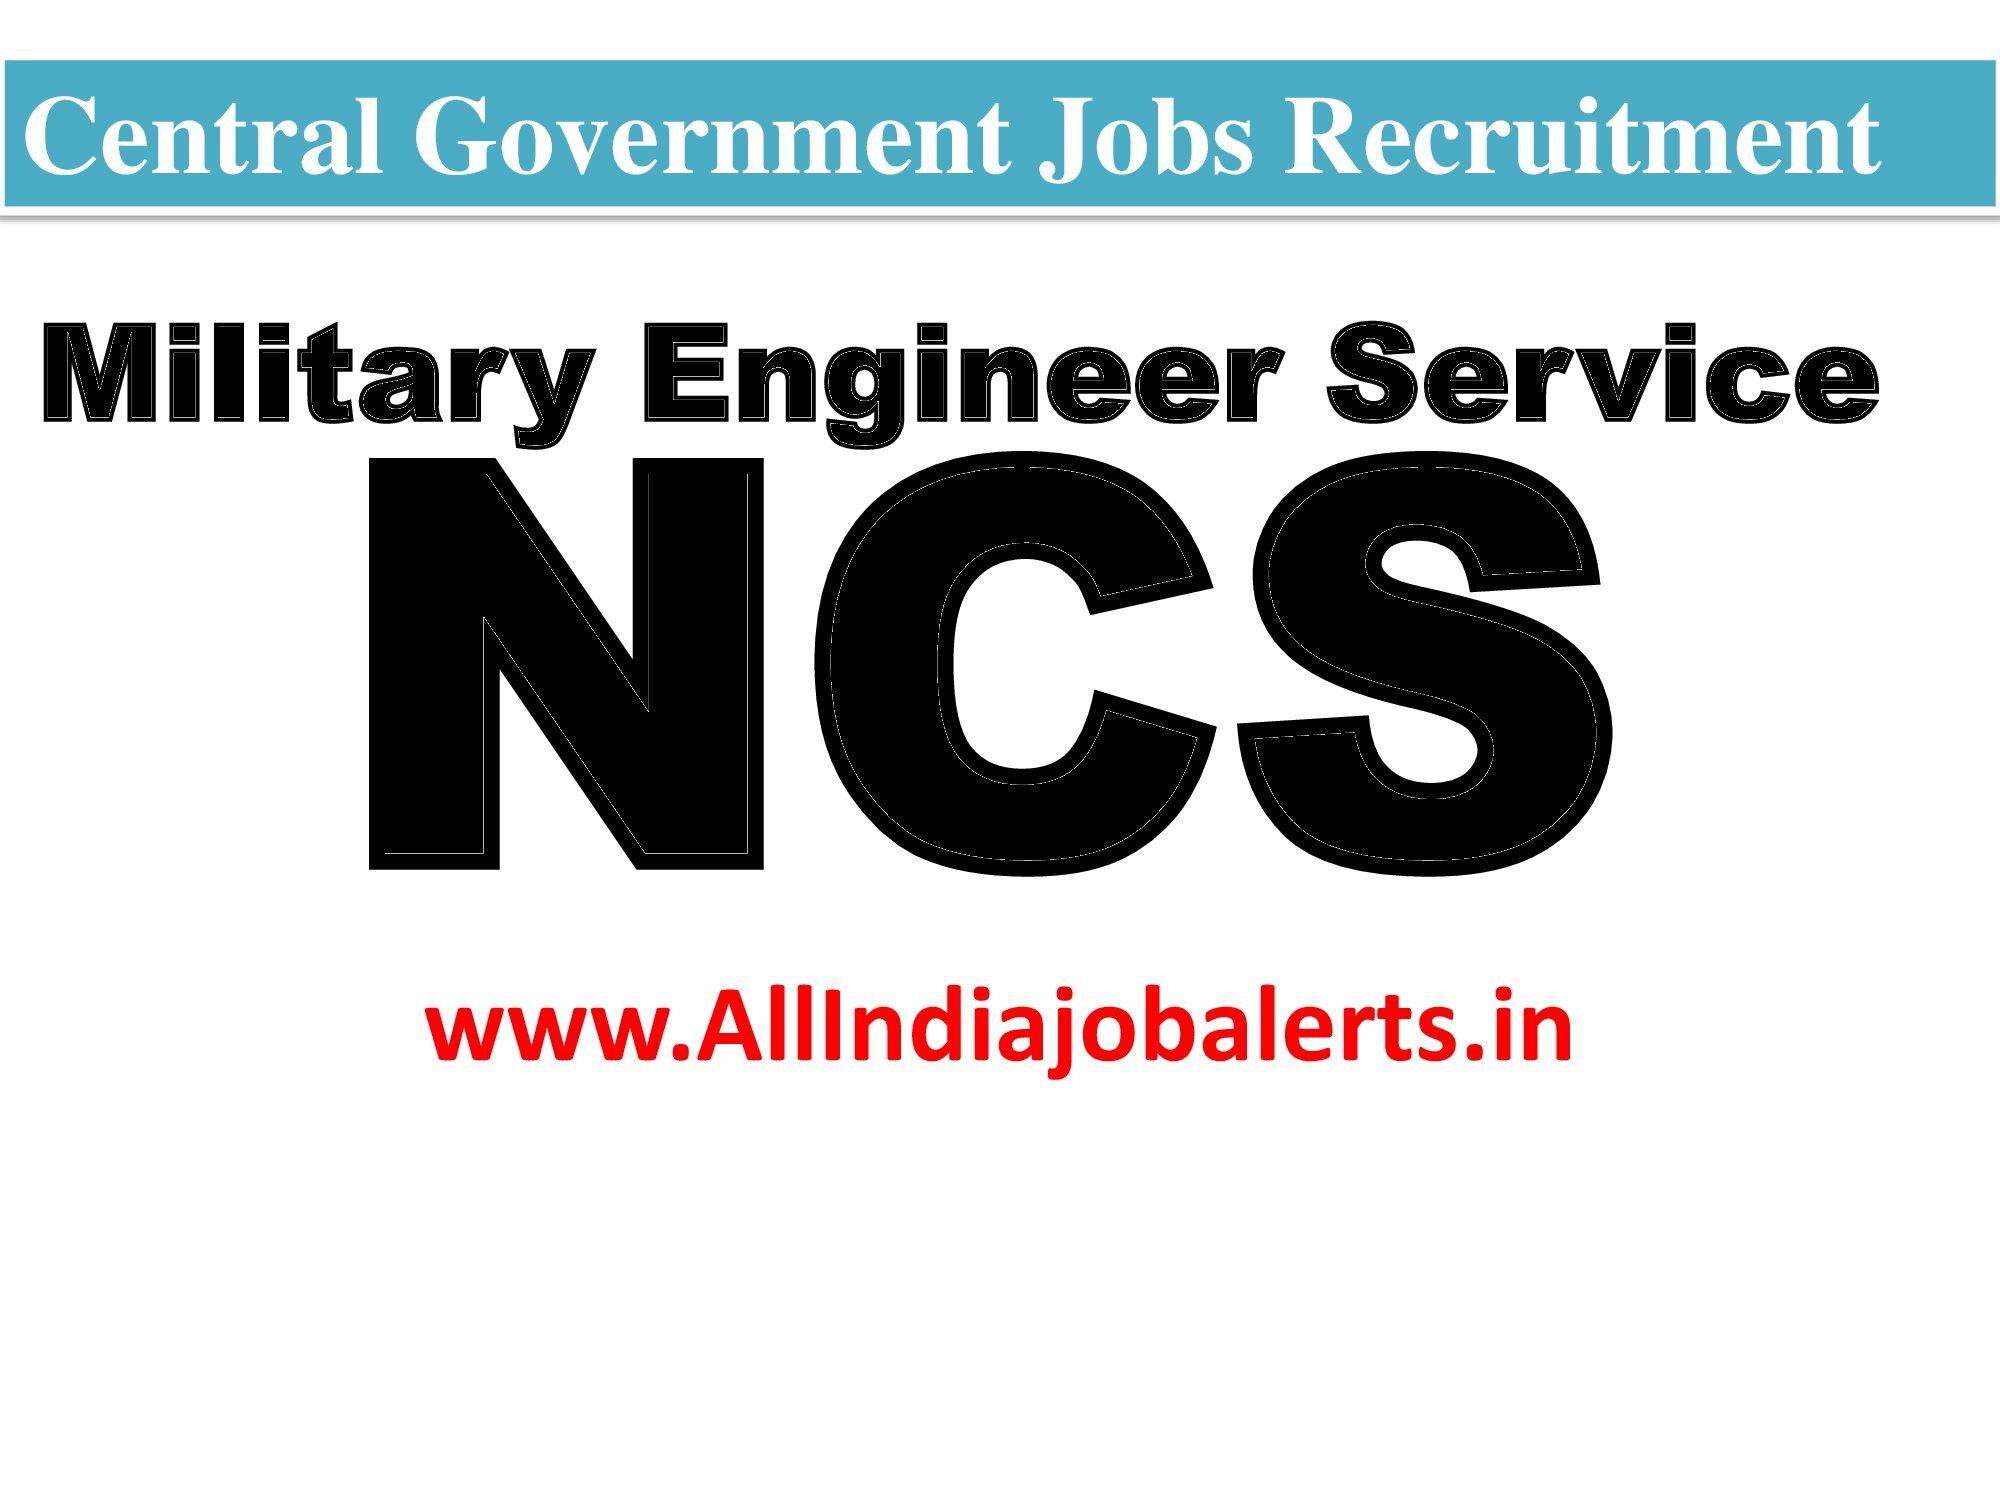 Military Engineer Service